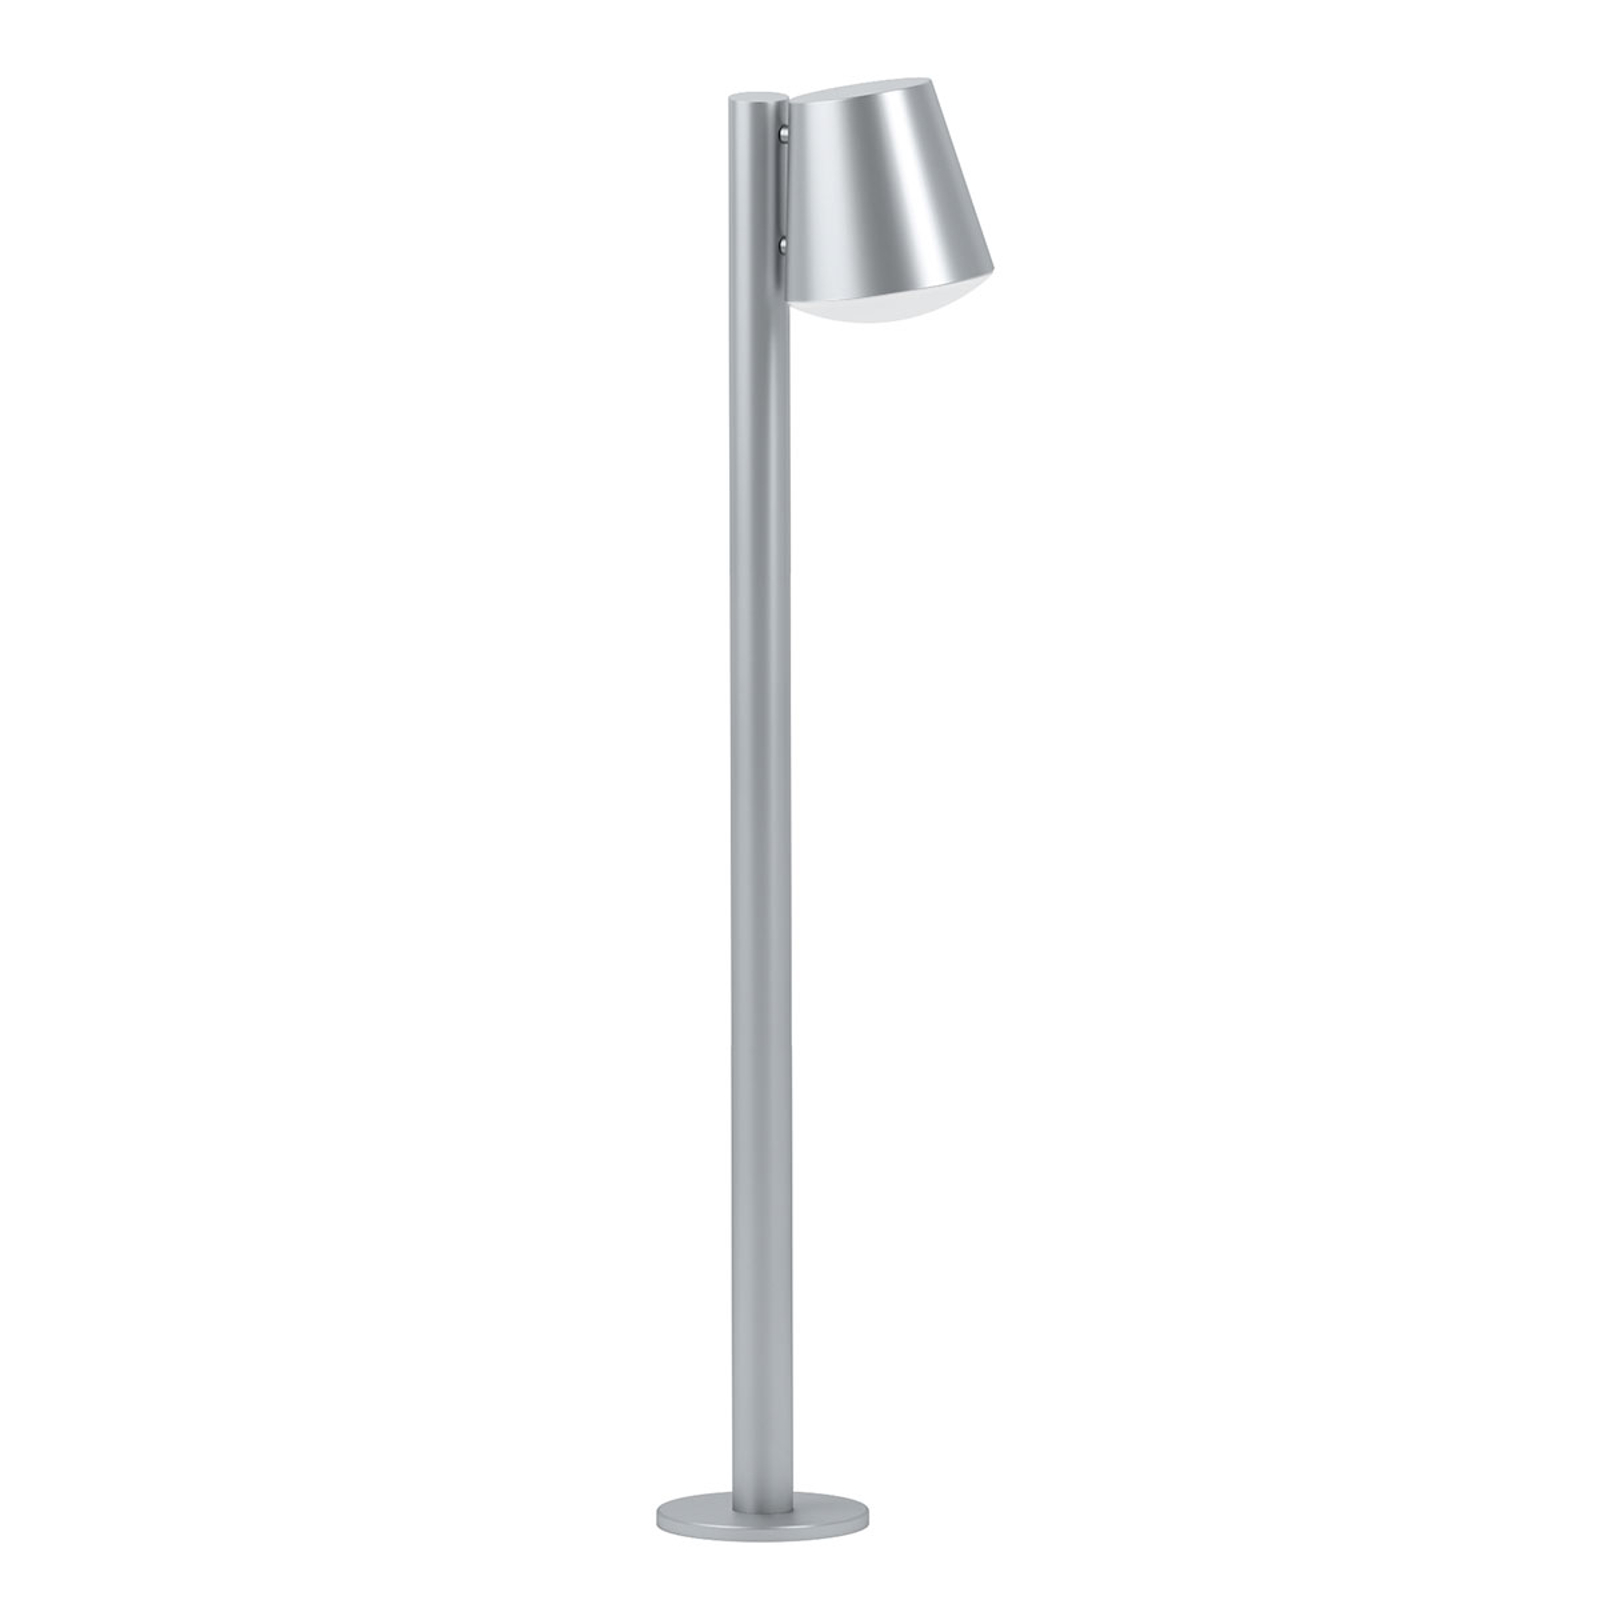 EGLO connect Caldiero-C gatelampe, rustfritt stål